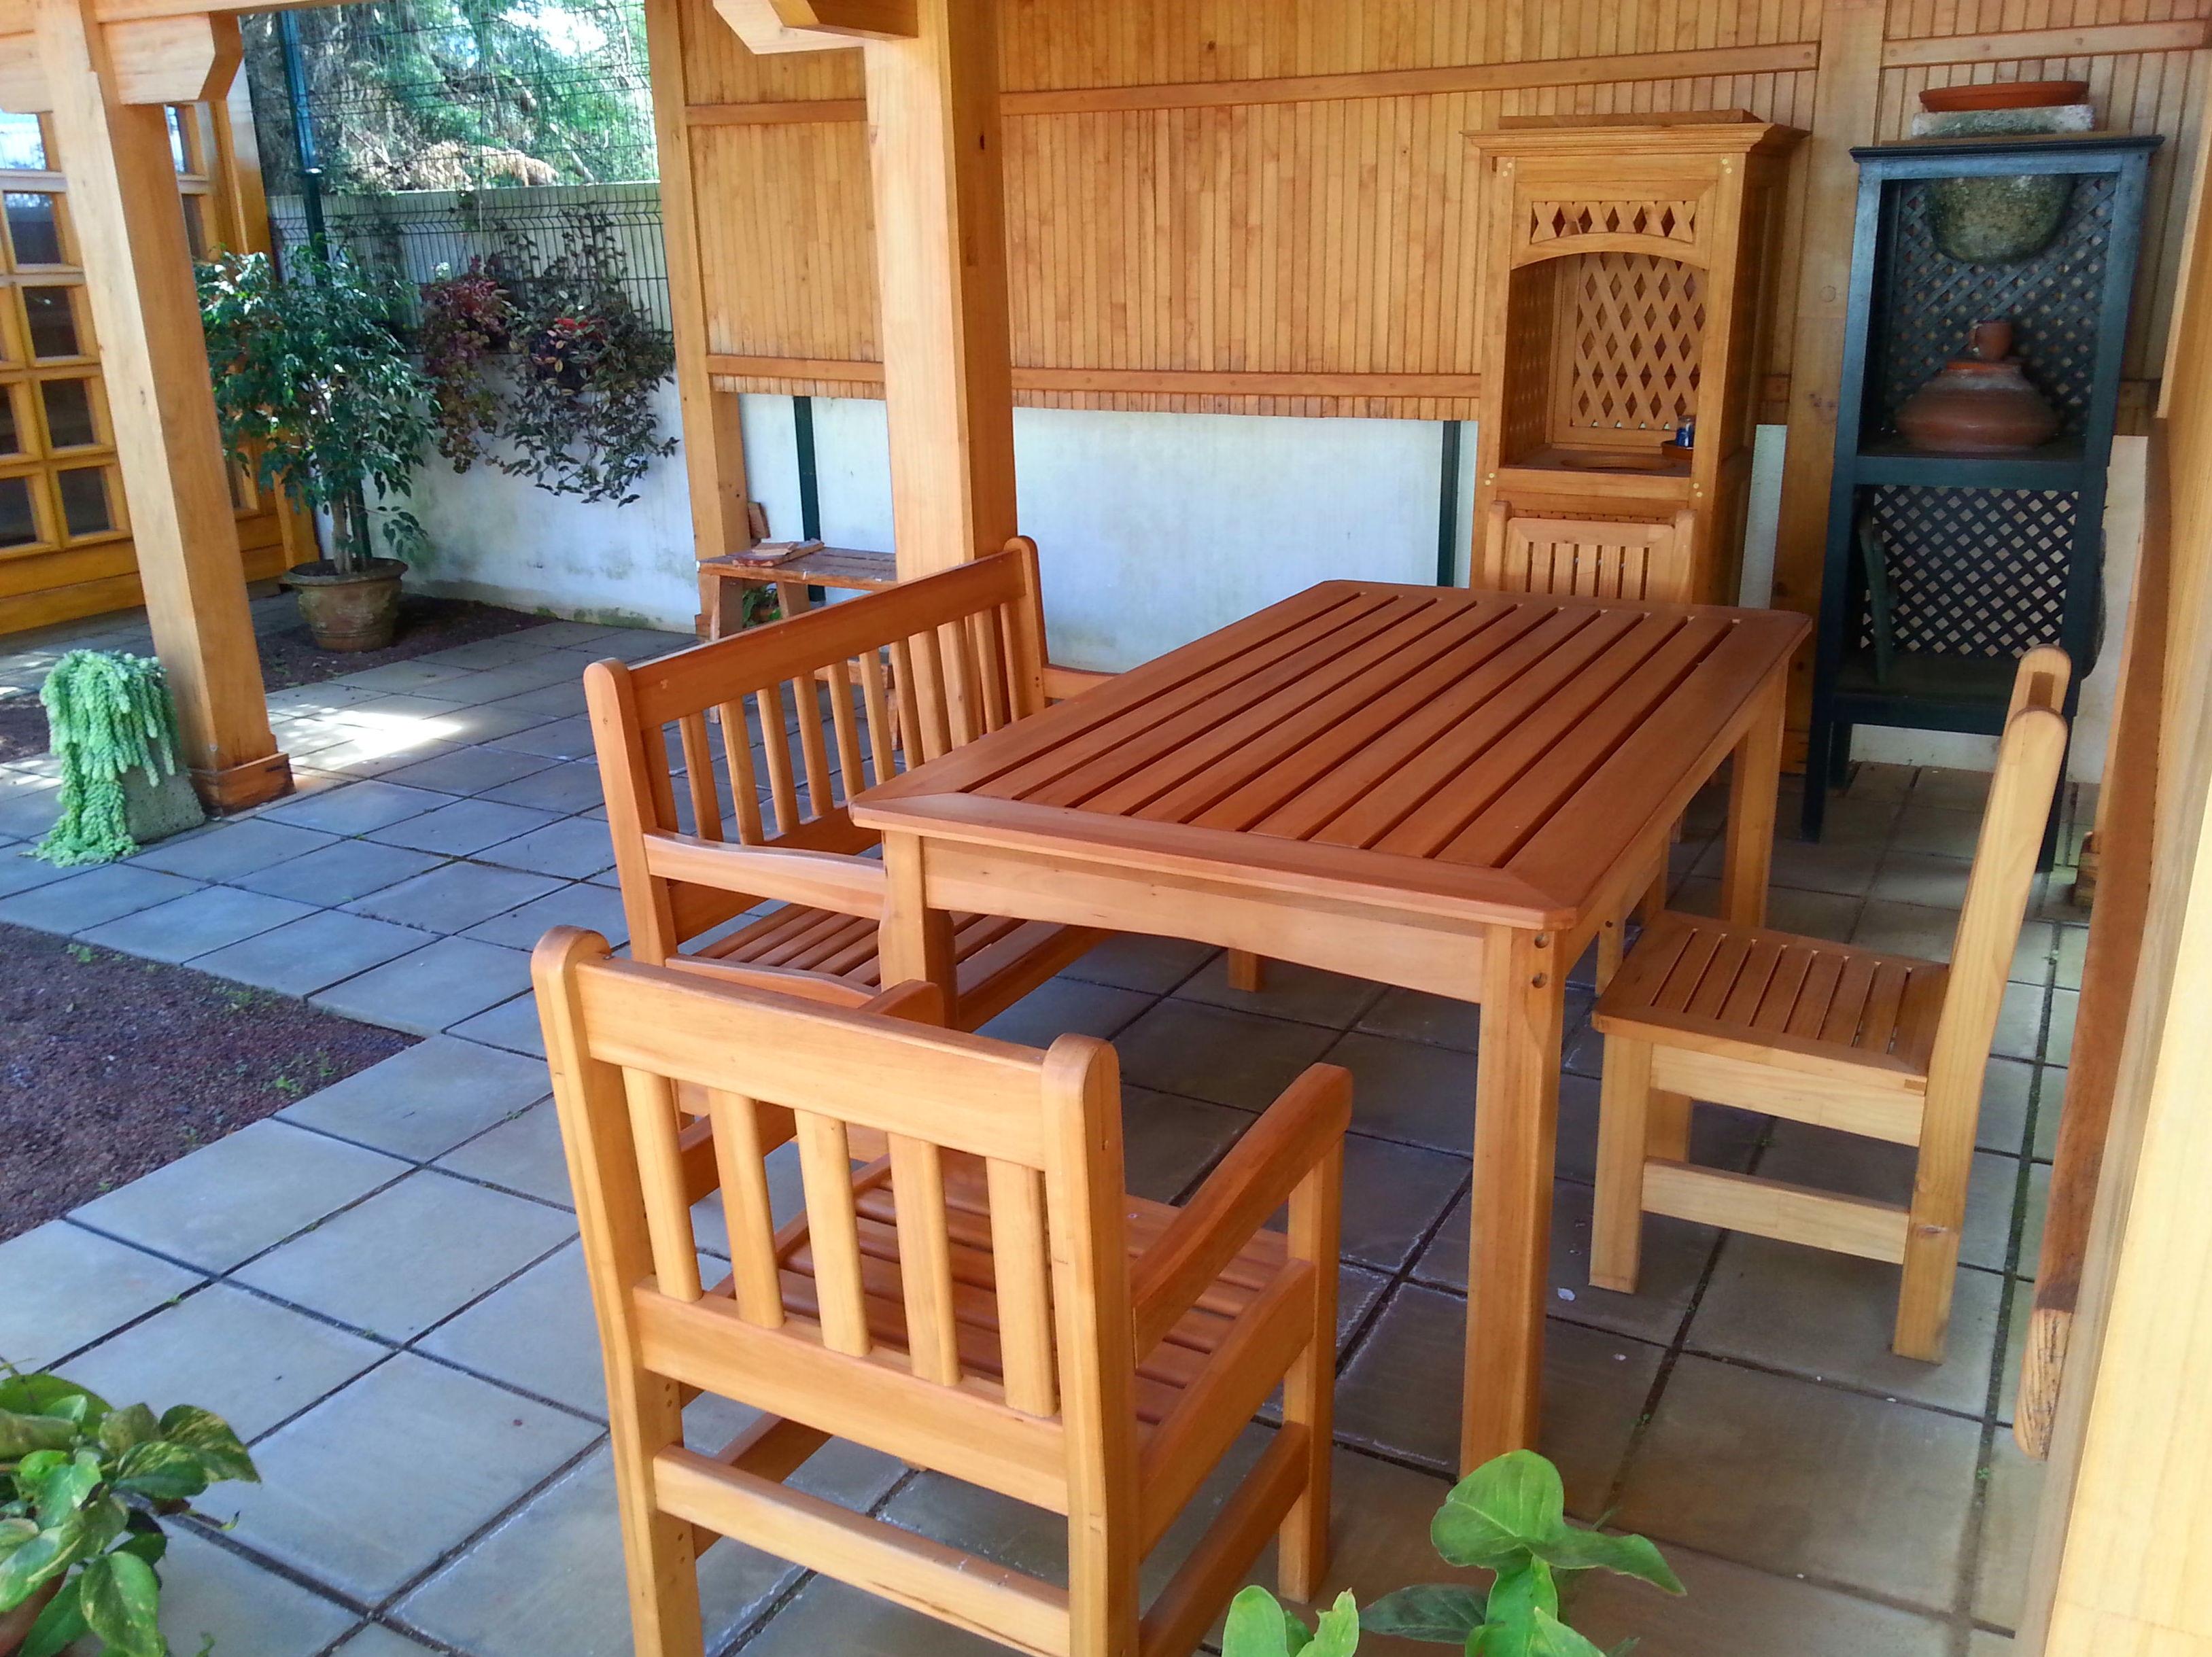 Muebles de Jardín Madera Maciza